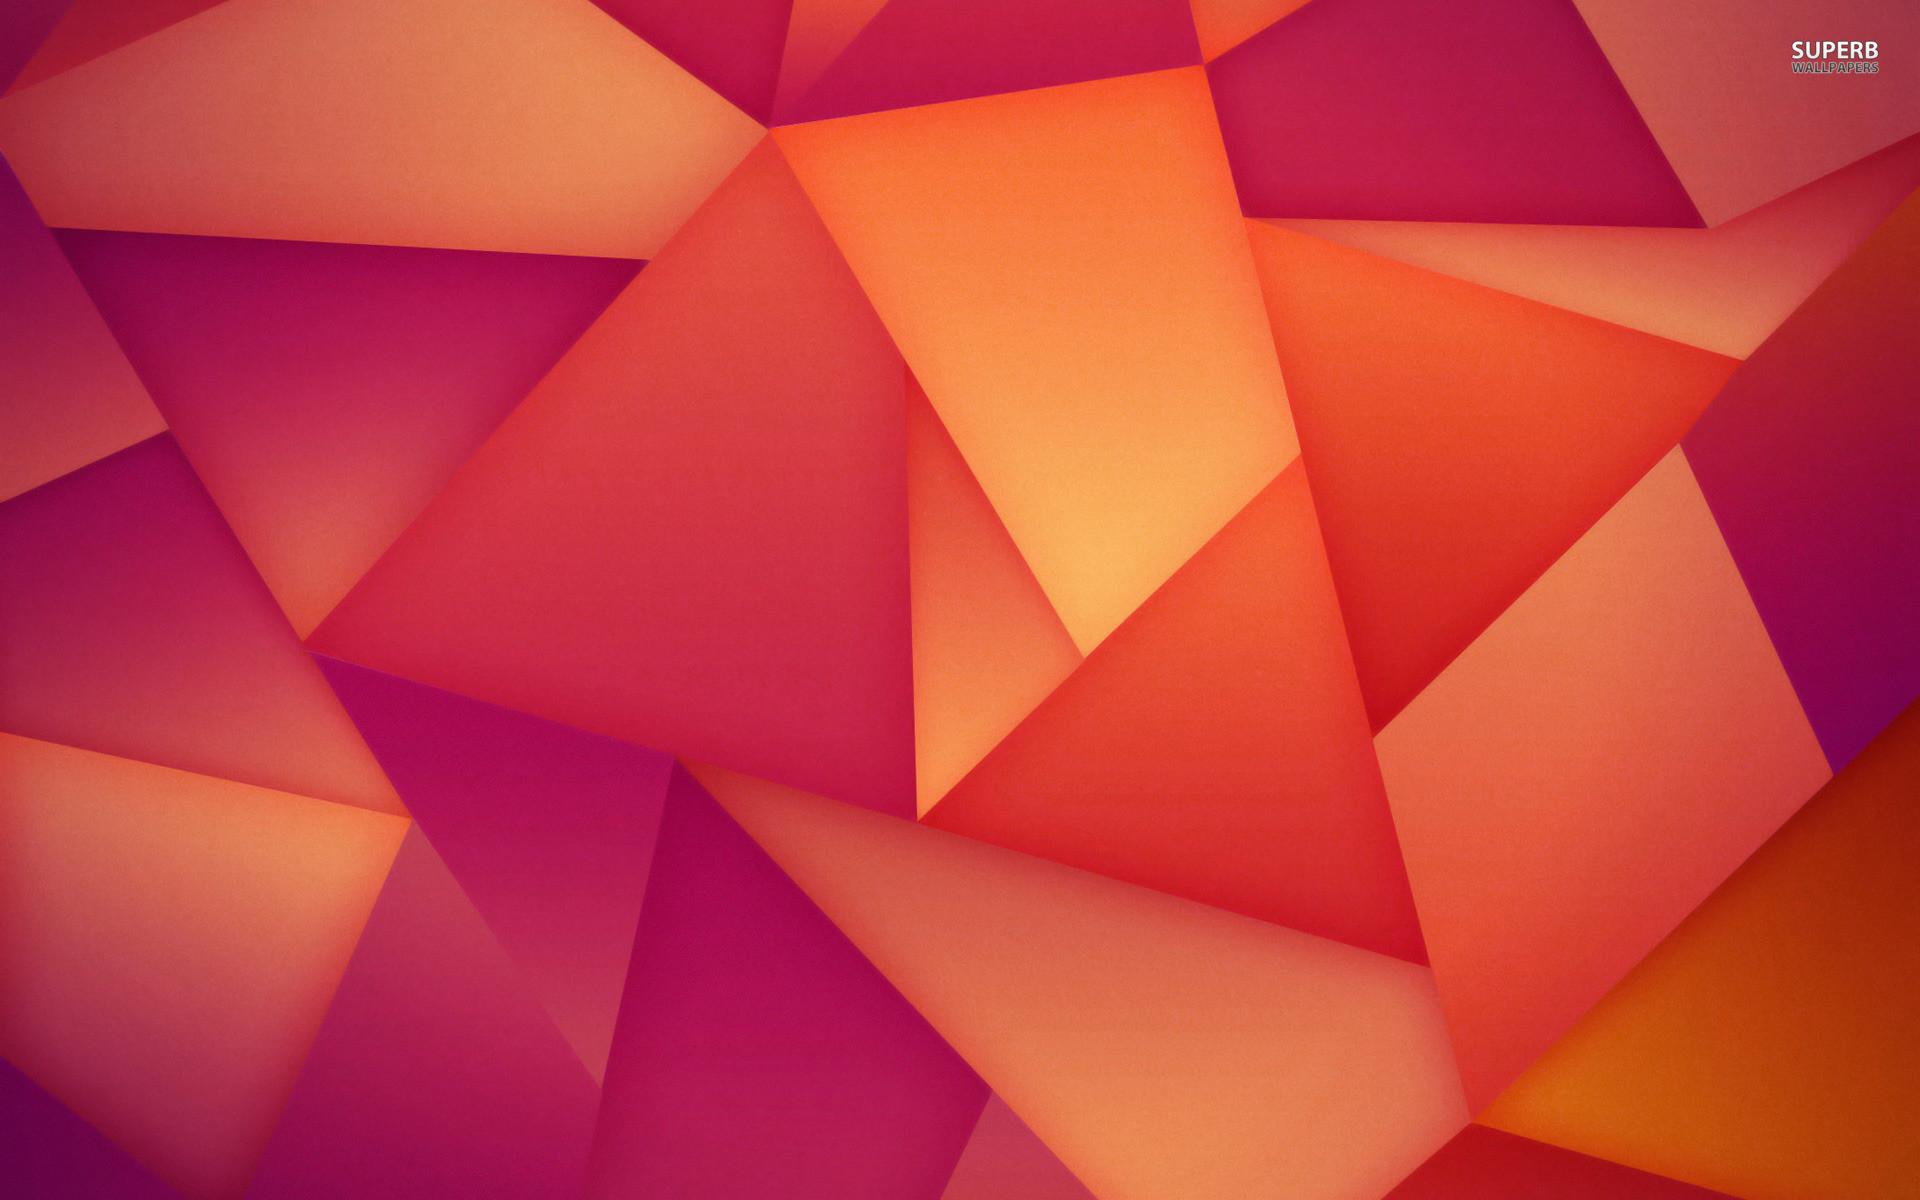 Orange and purple polygons wallpaper – 1067243